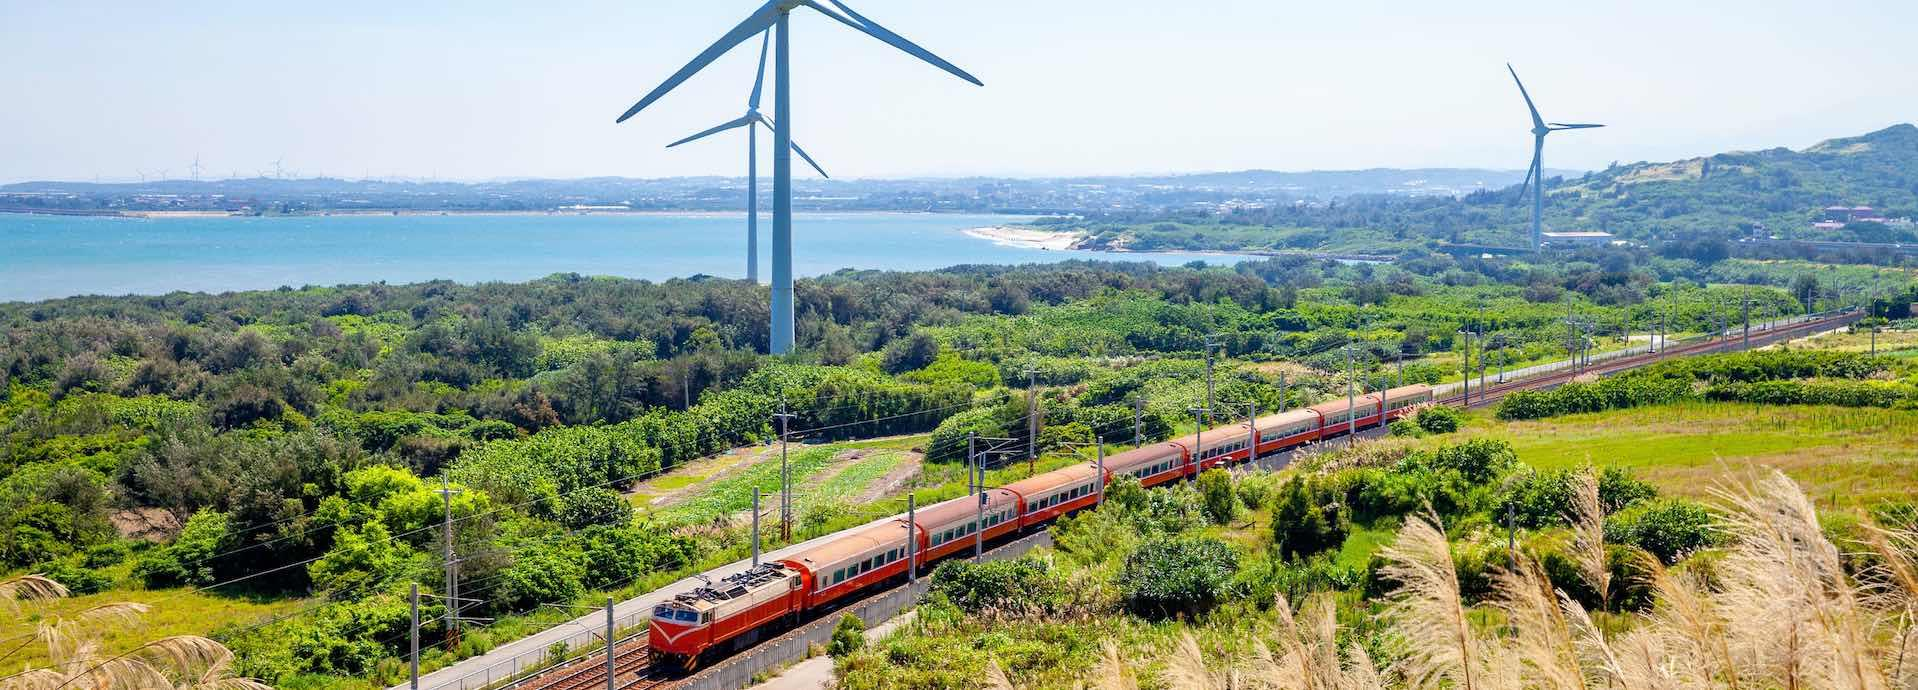 Train passing before wind turbines